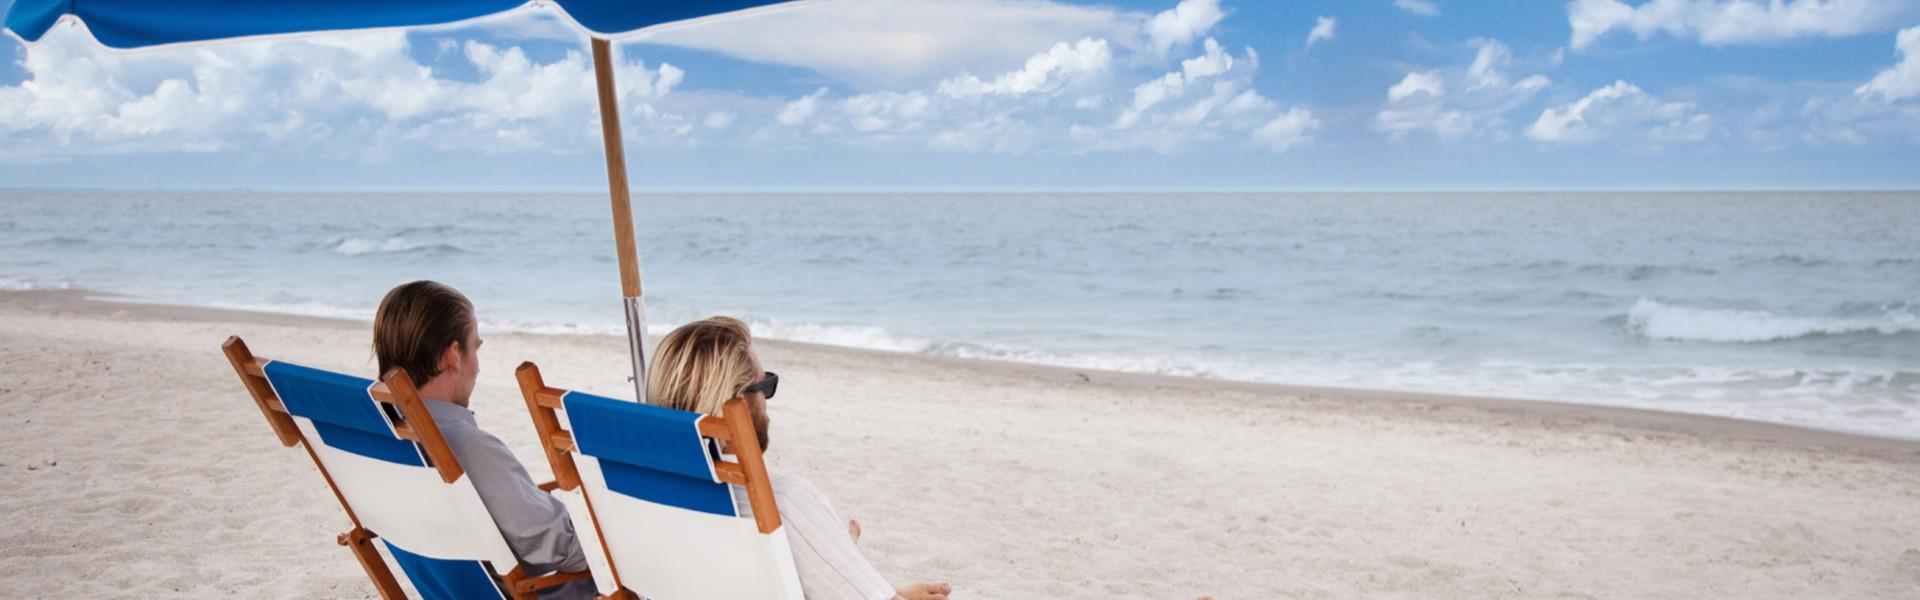 Westgate Cocoa Beach Resort in Cocoa Beach FL is the best place to be in Cocoa Beach   Westgate Coca Beach Resort